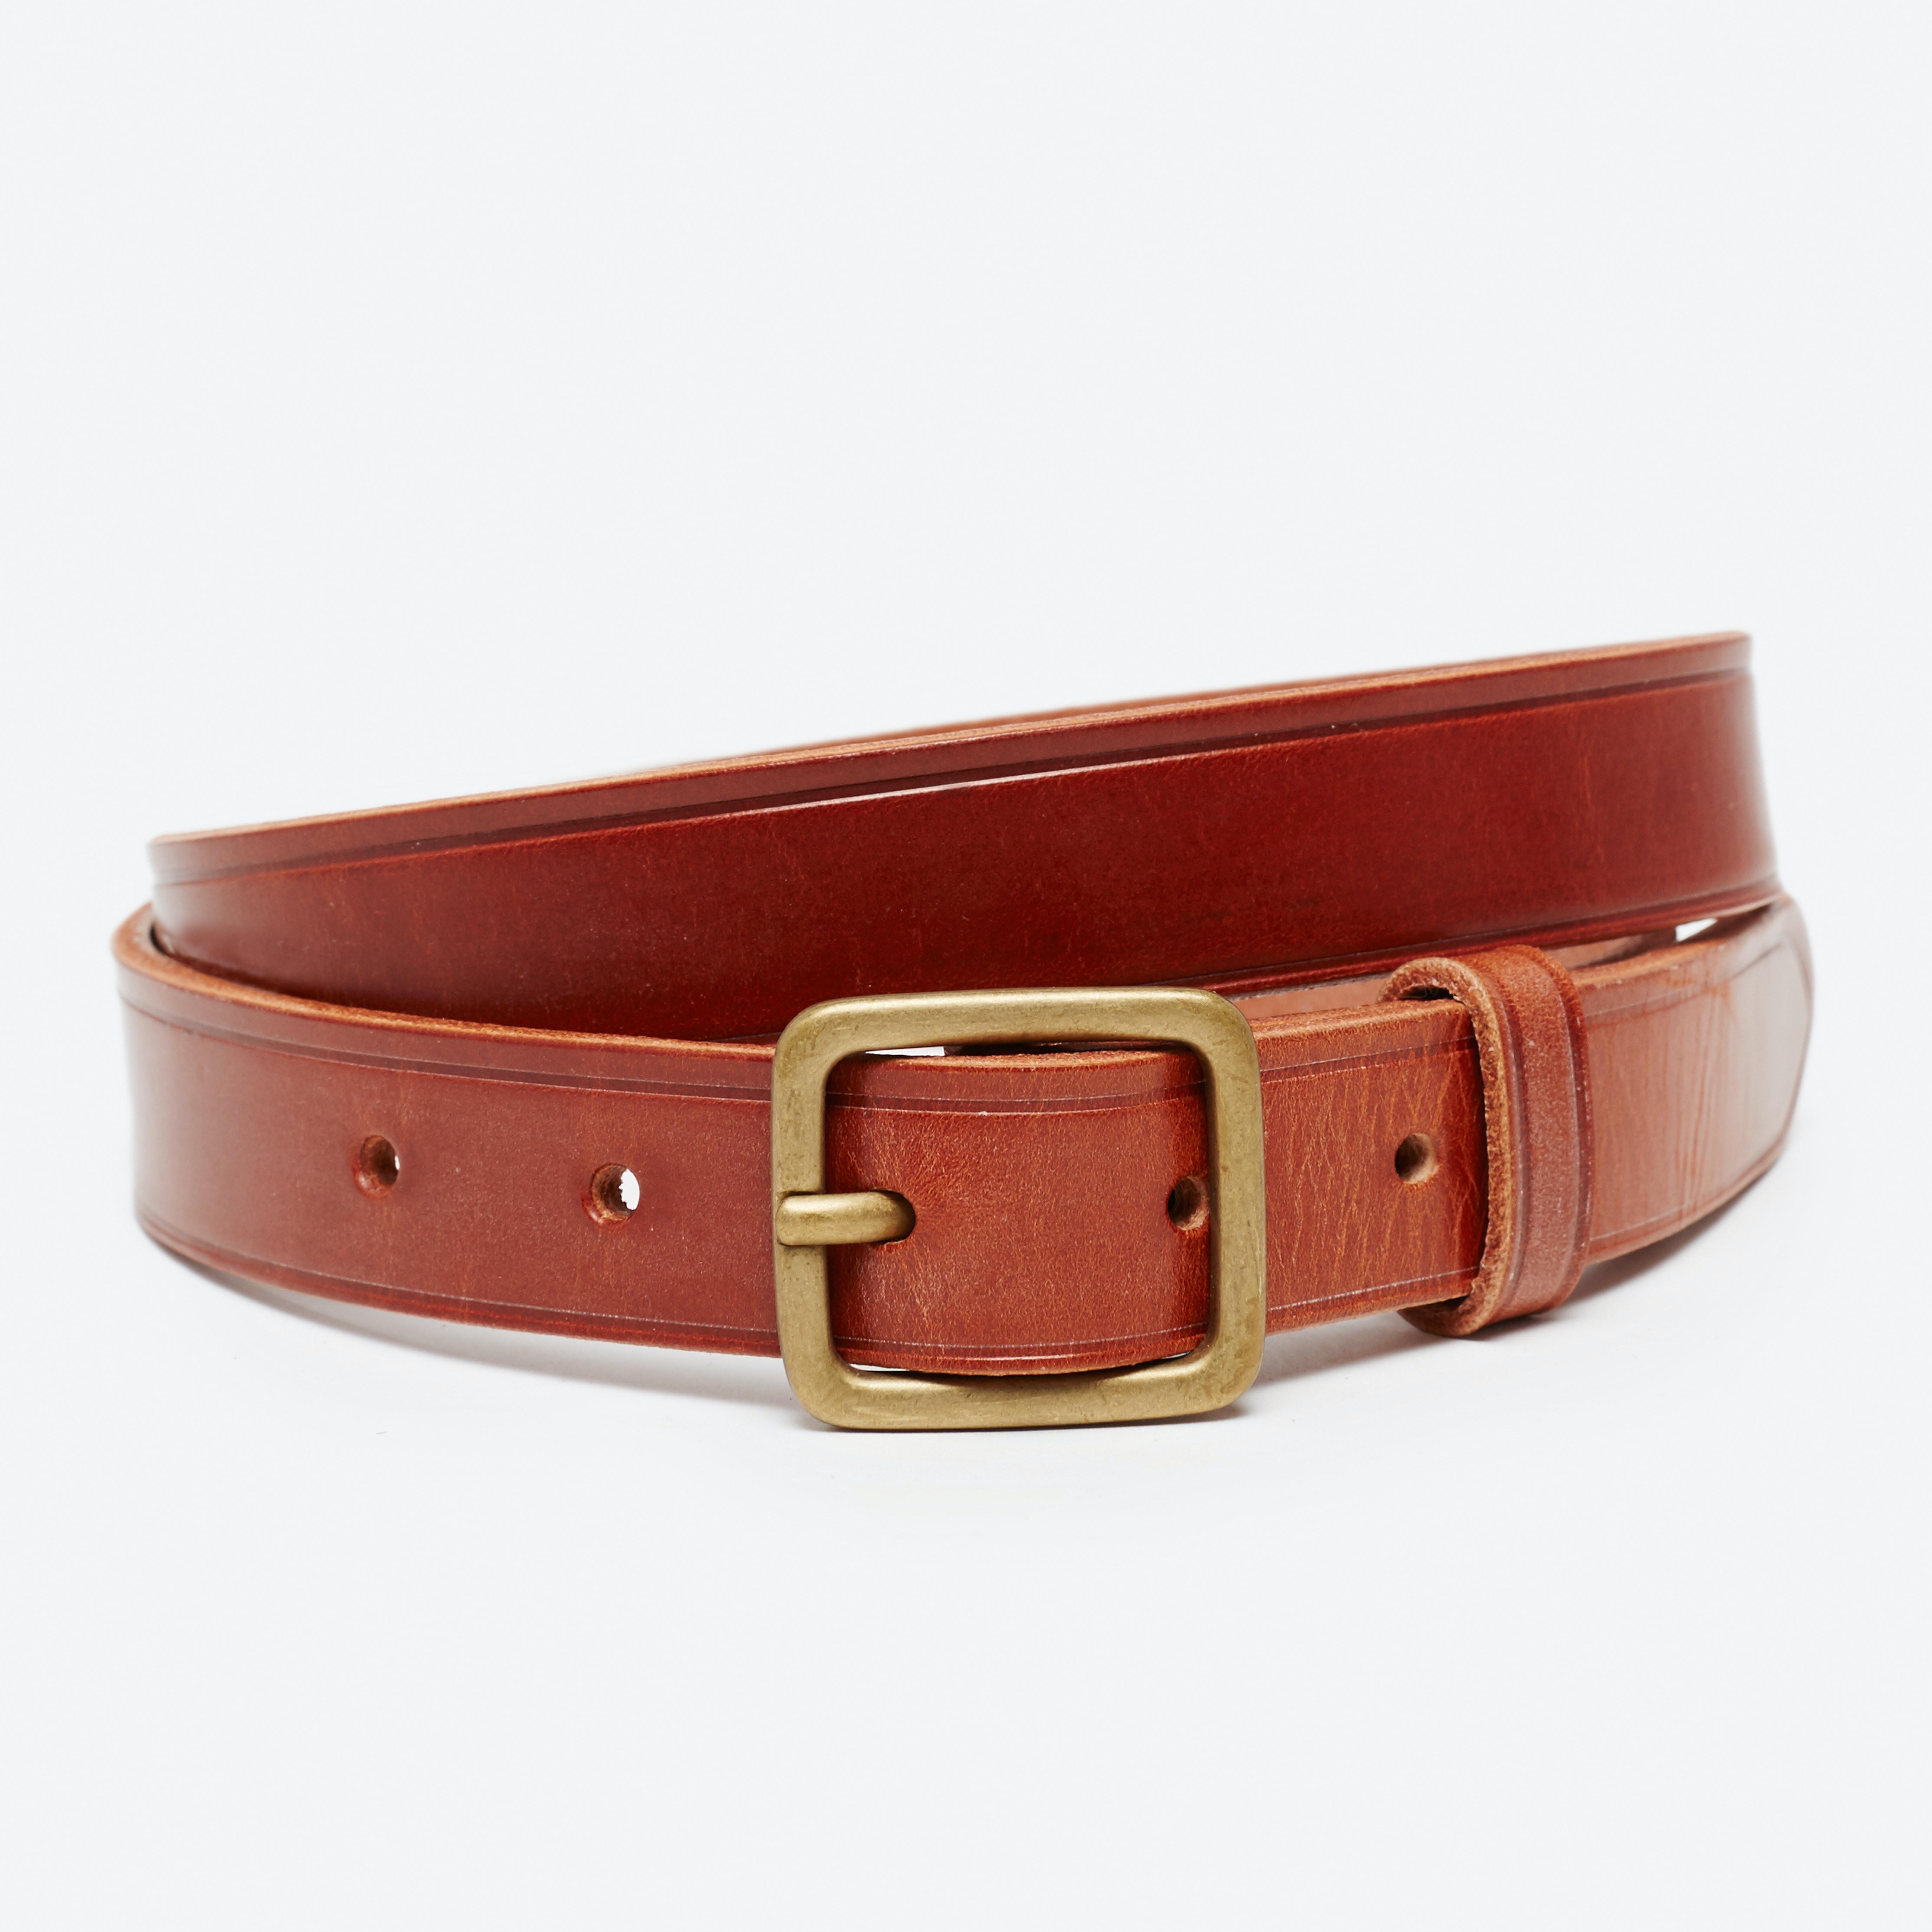 Narrow Leather Dress Belt